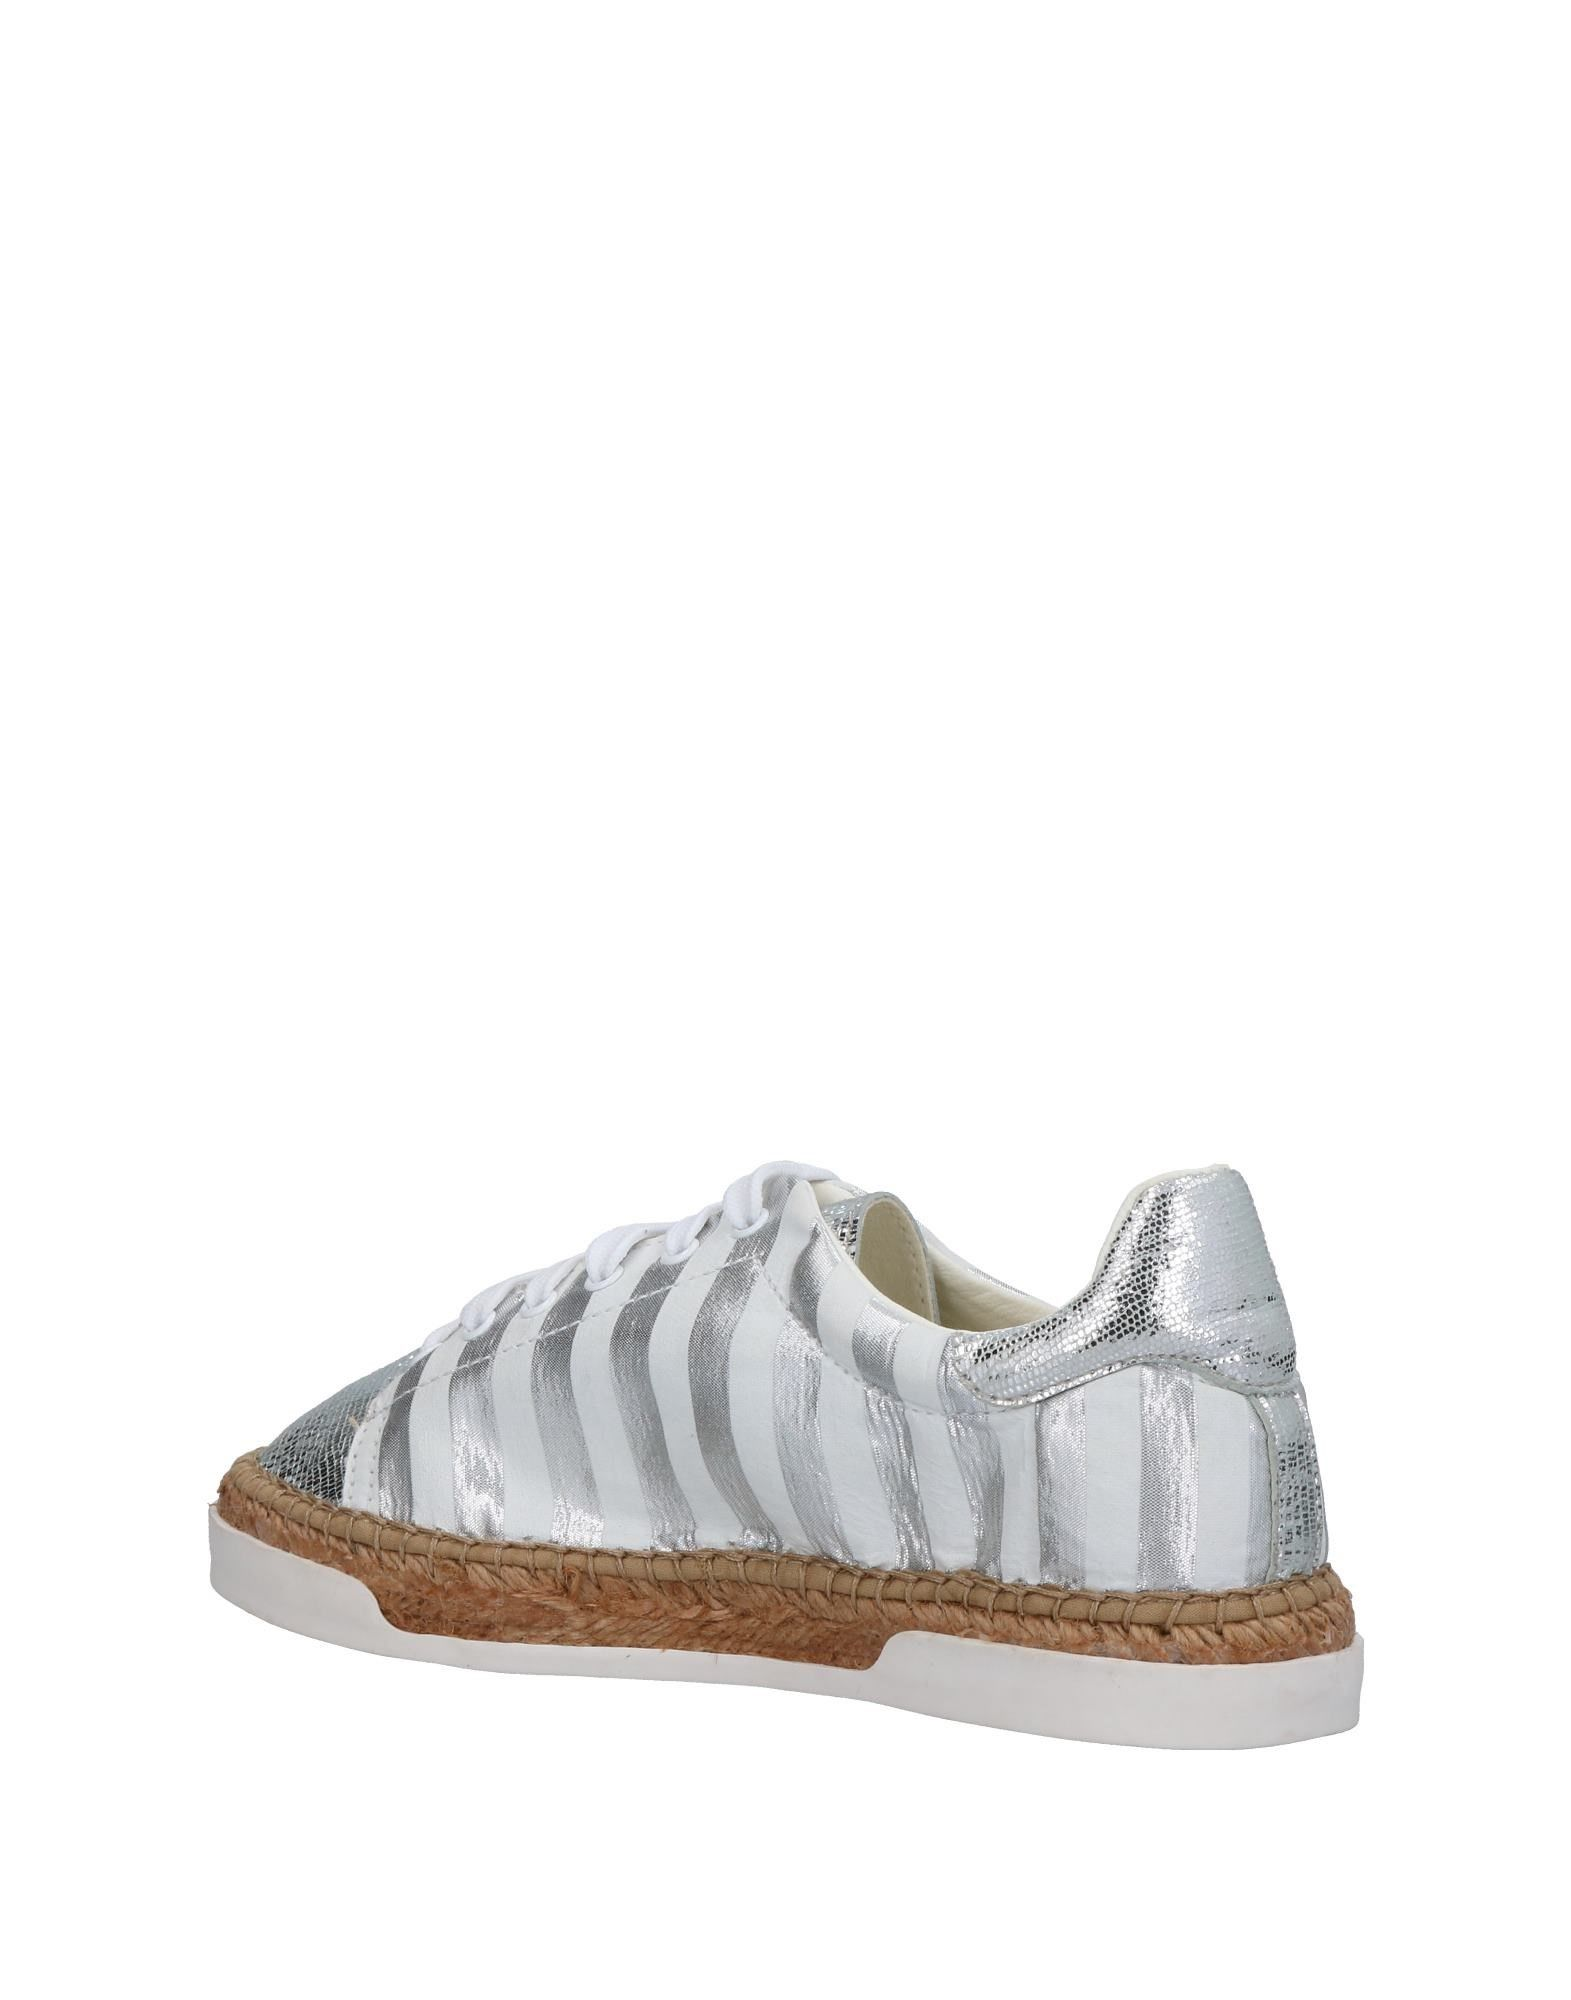 Sneakers Patrizia Pepe Femme - Sneakers Patrizia Pepe sur